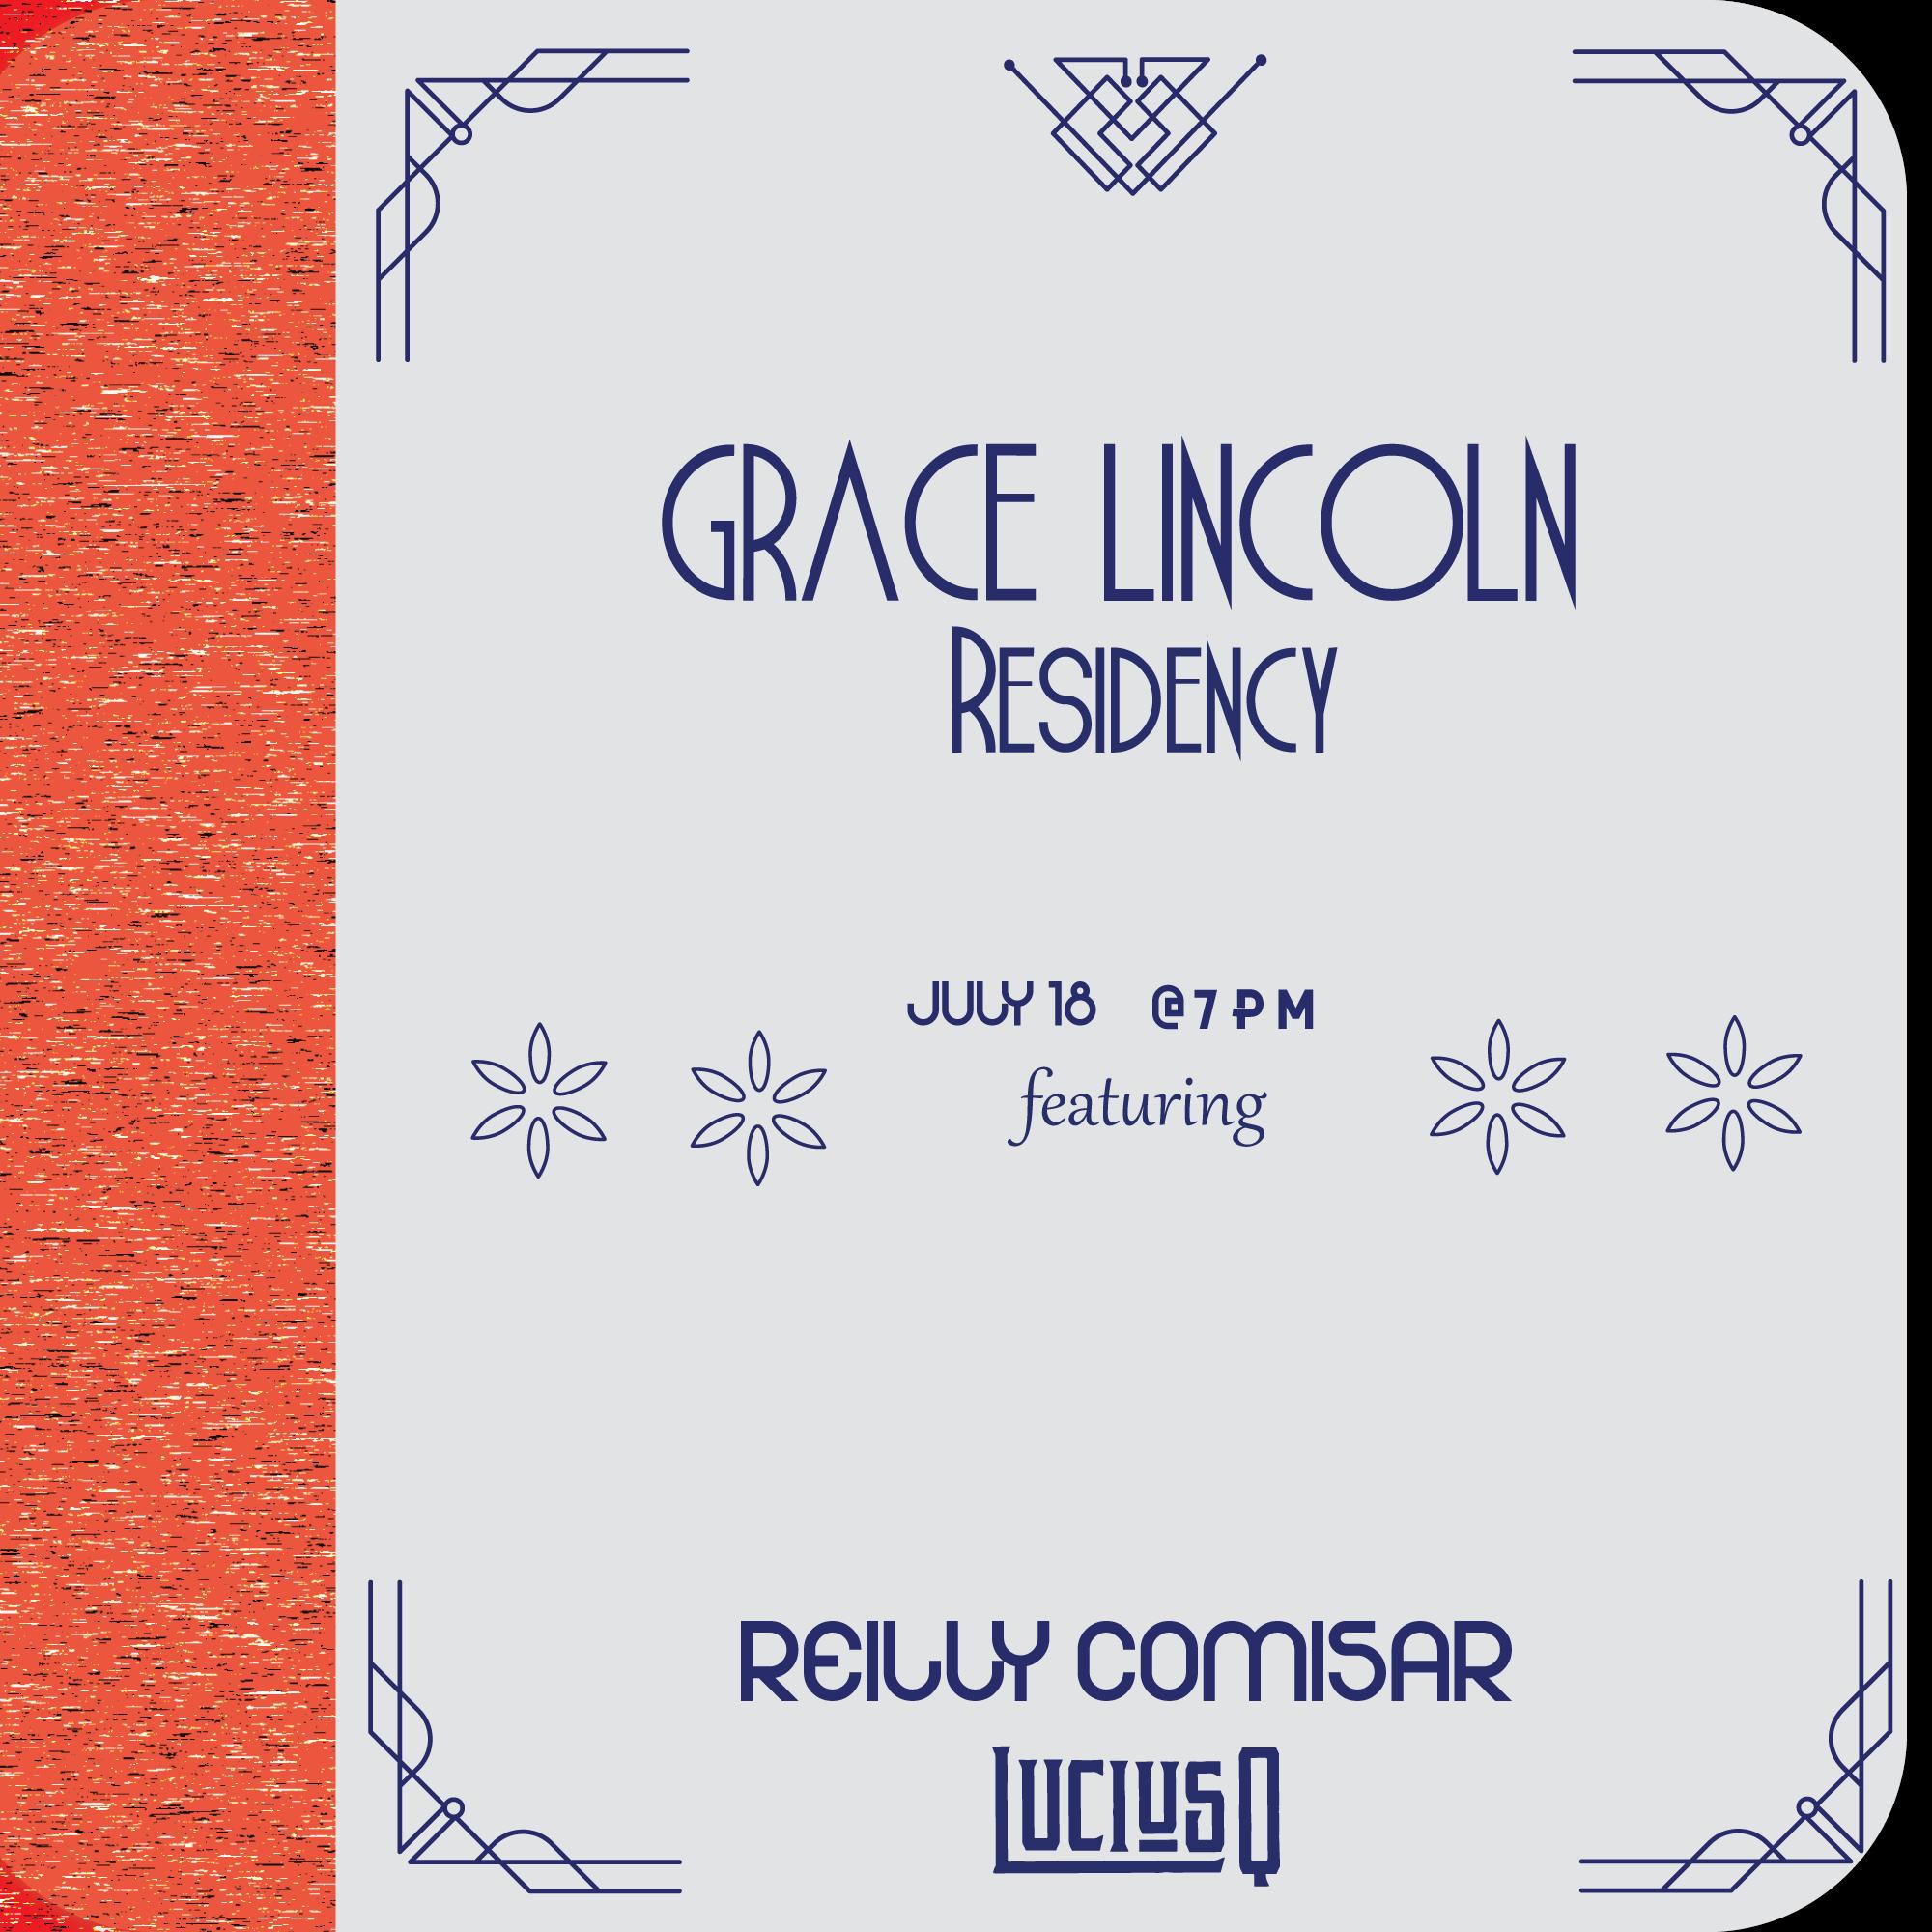 FiR-Creative---LuciusQ---GraceLincoln---July-18.png